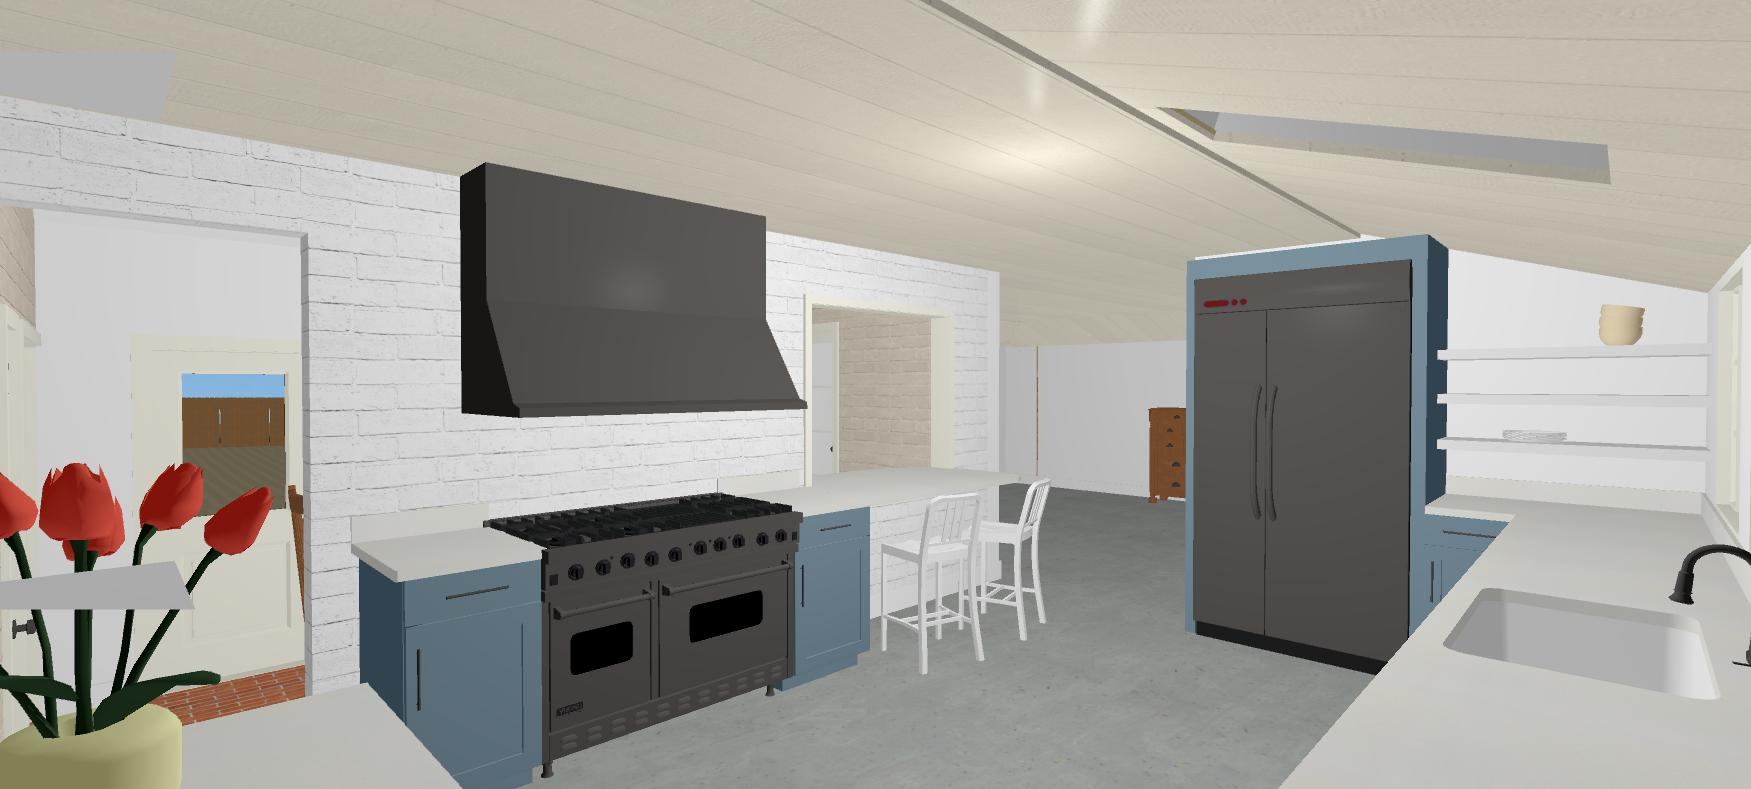 Ojai_remodel_Arbolada_kitchen3_2016_0131